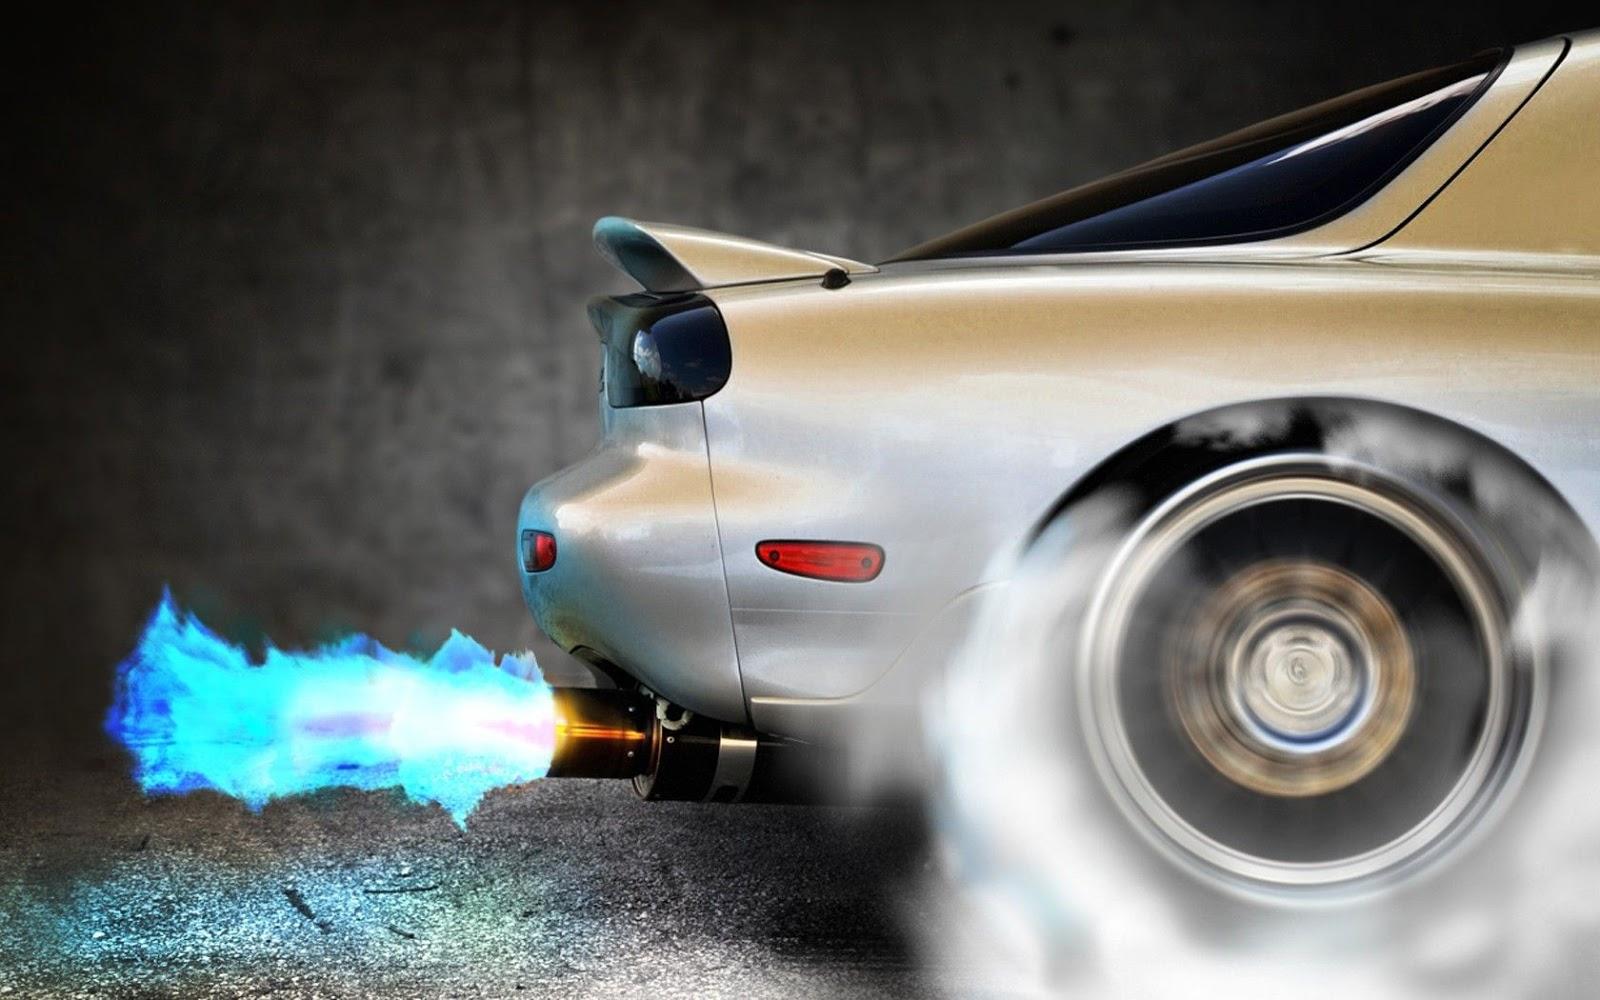 mazda4 Η Mazda ΔΕΝ σκότωσε το RX, λέει ο CEO της